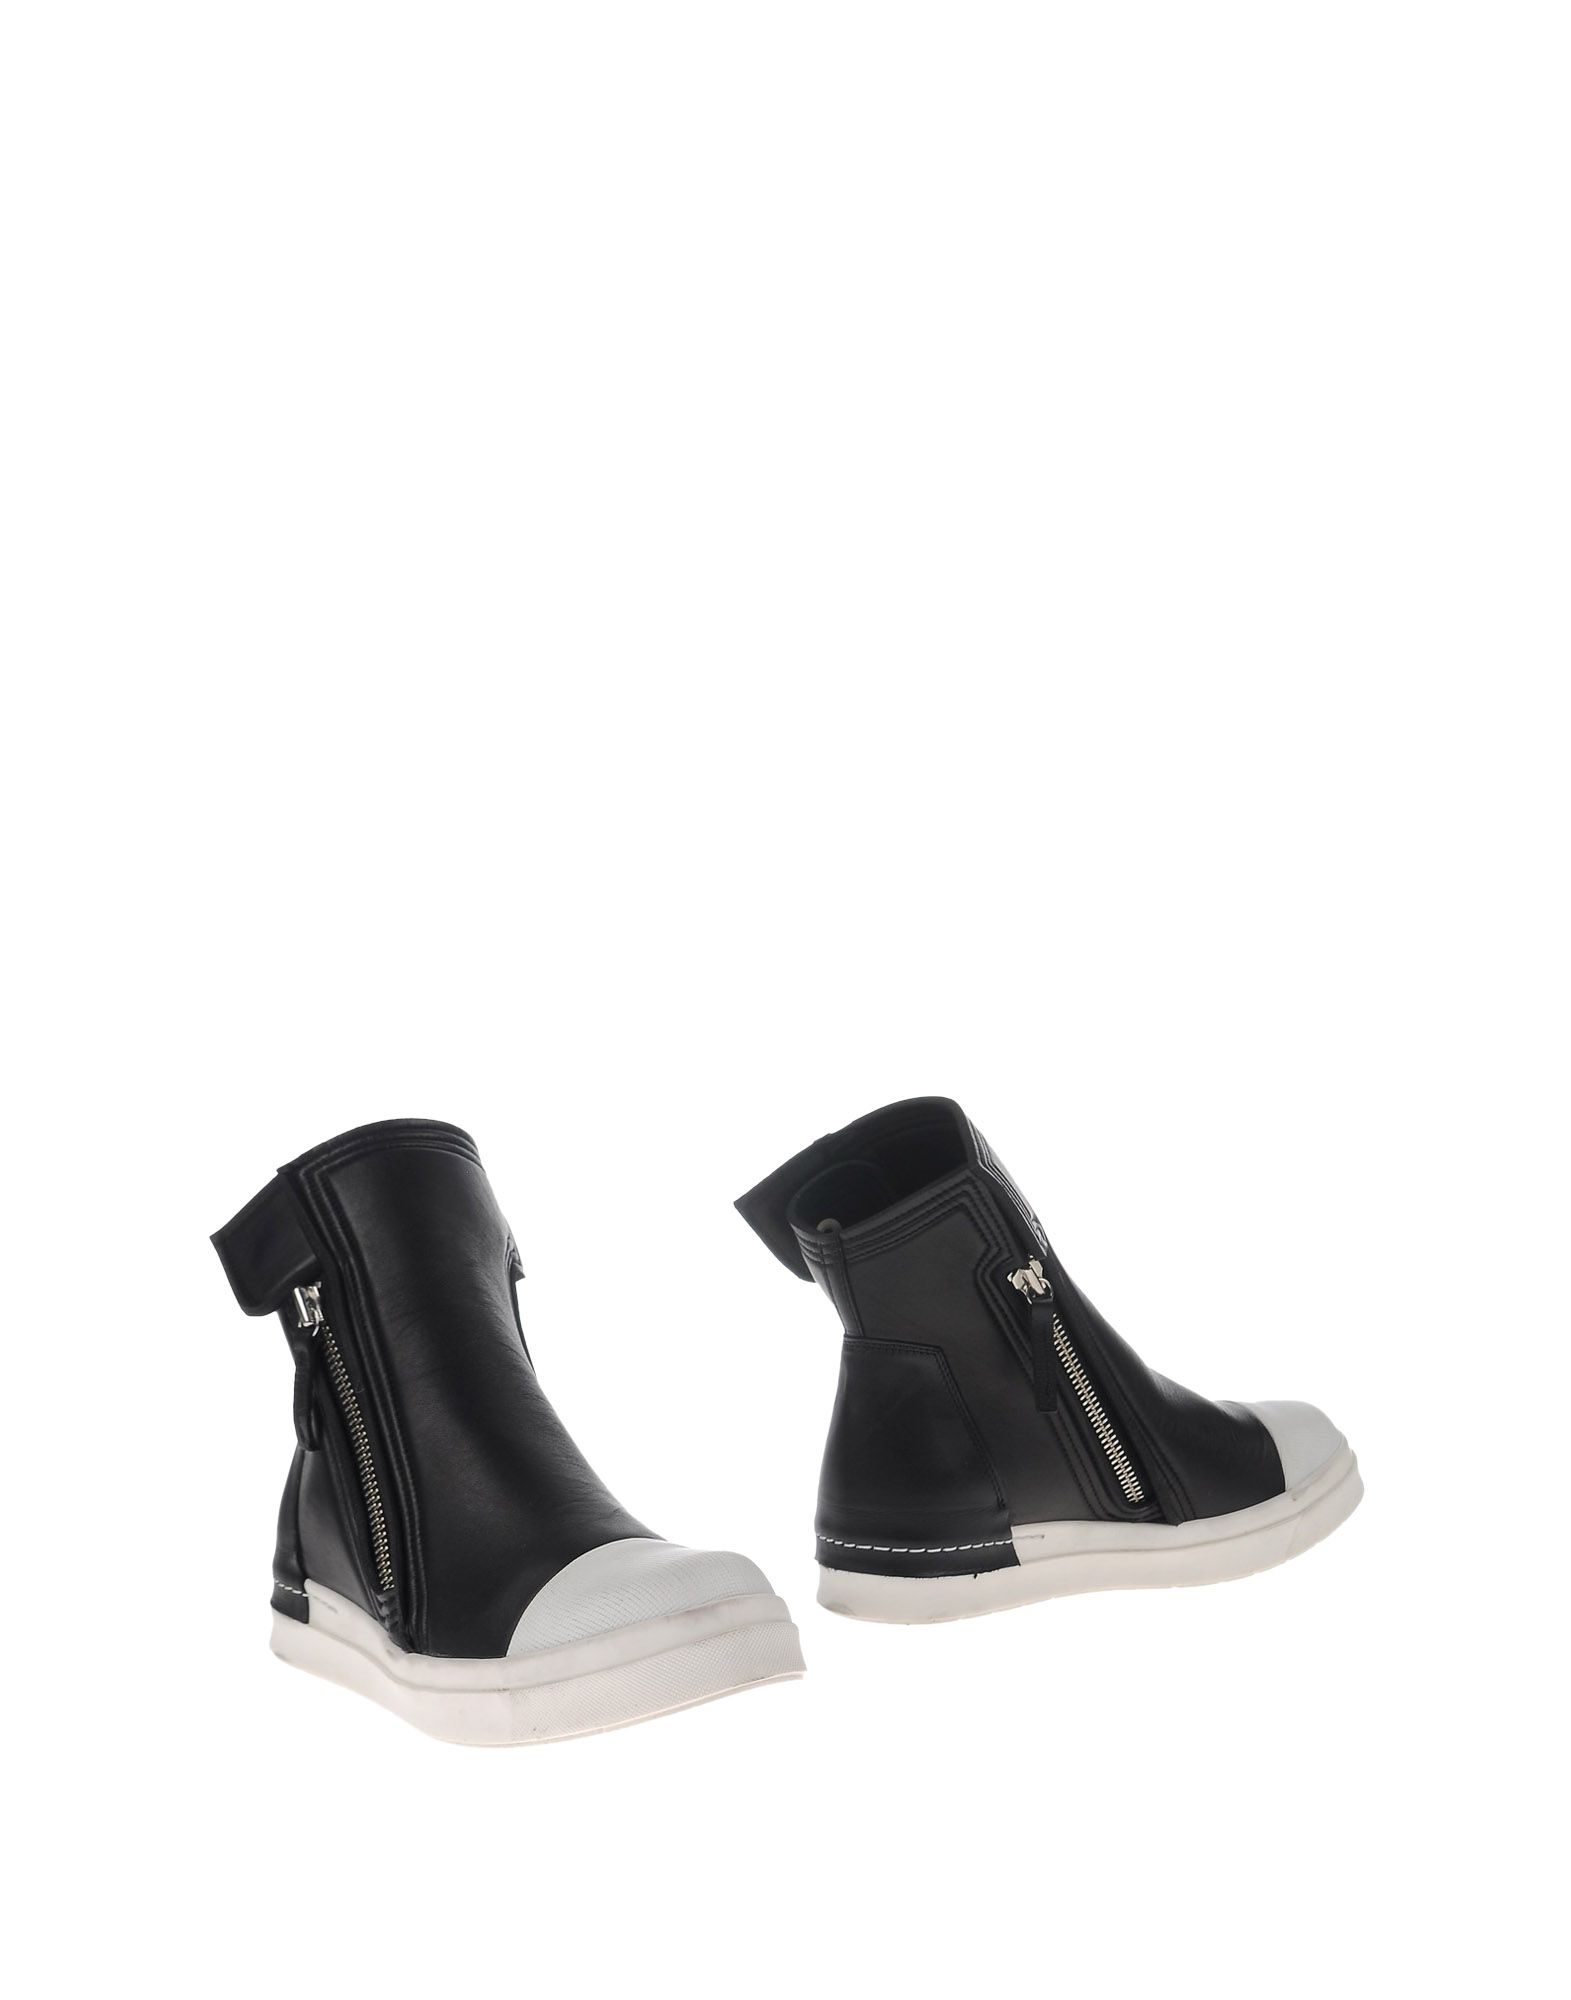 CA by CINZIA ARAIA Полусапоги и высокие ботинки ca by cinzia araia высокие кеды и кроссовки